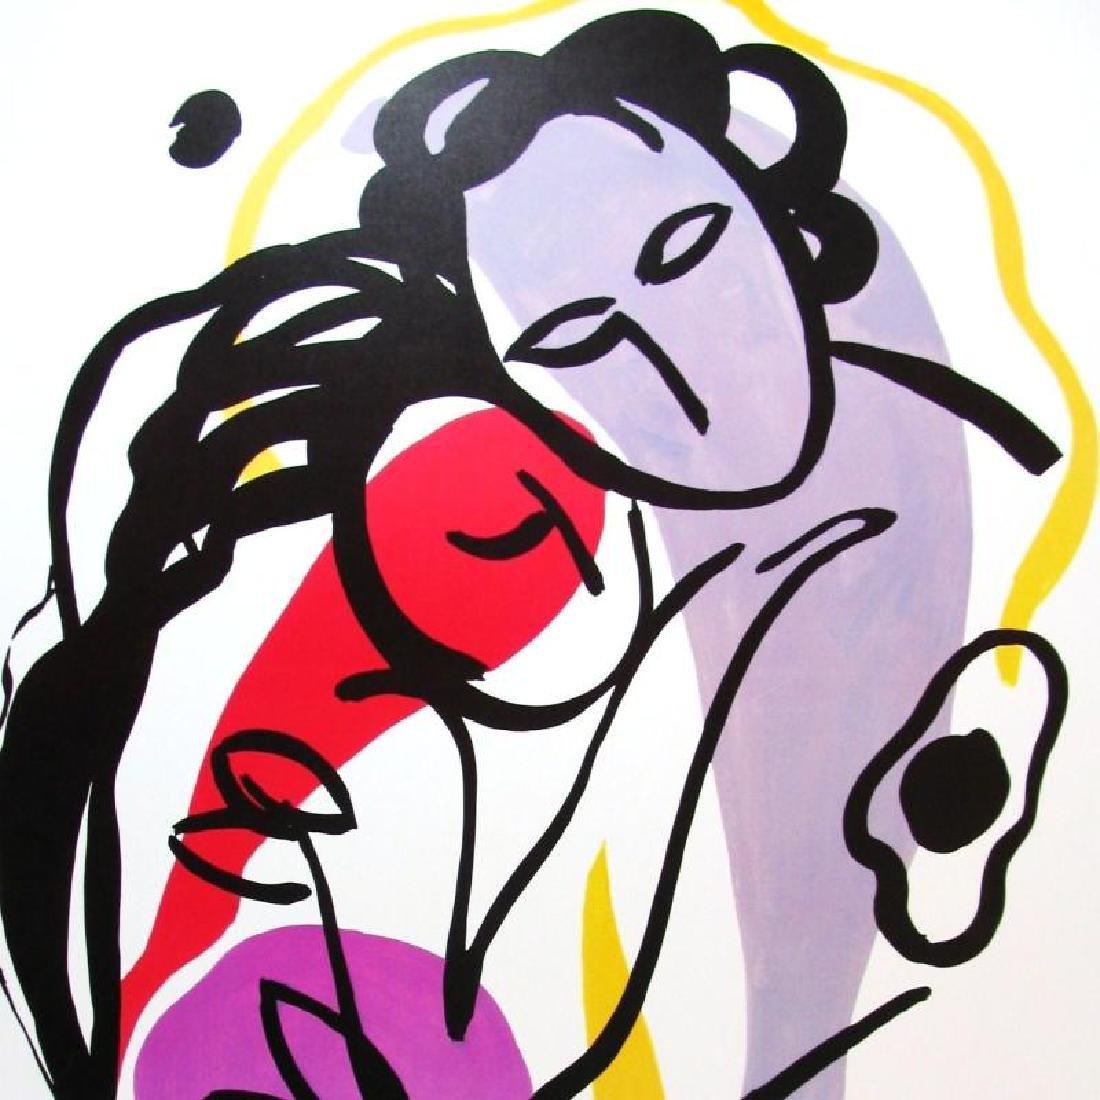 The Hug Print Colorful Modern Art Cheap! - 2